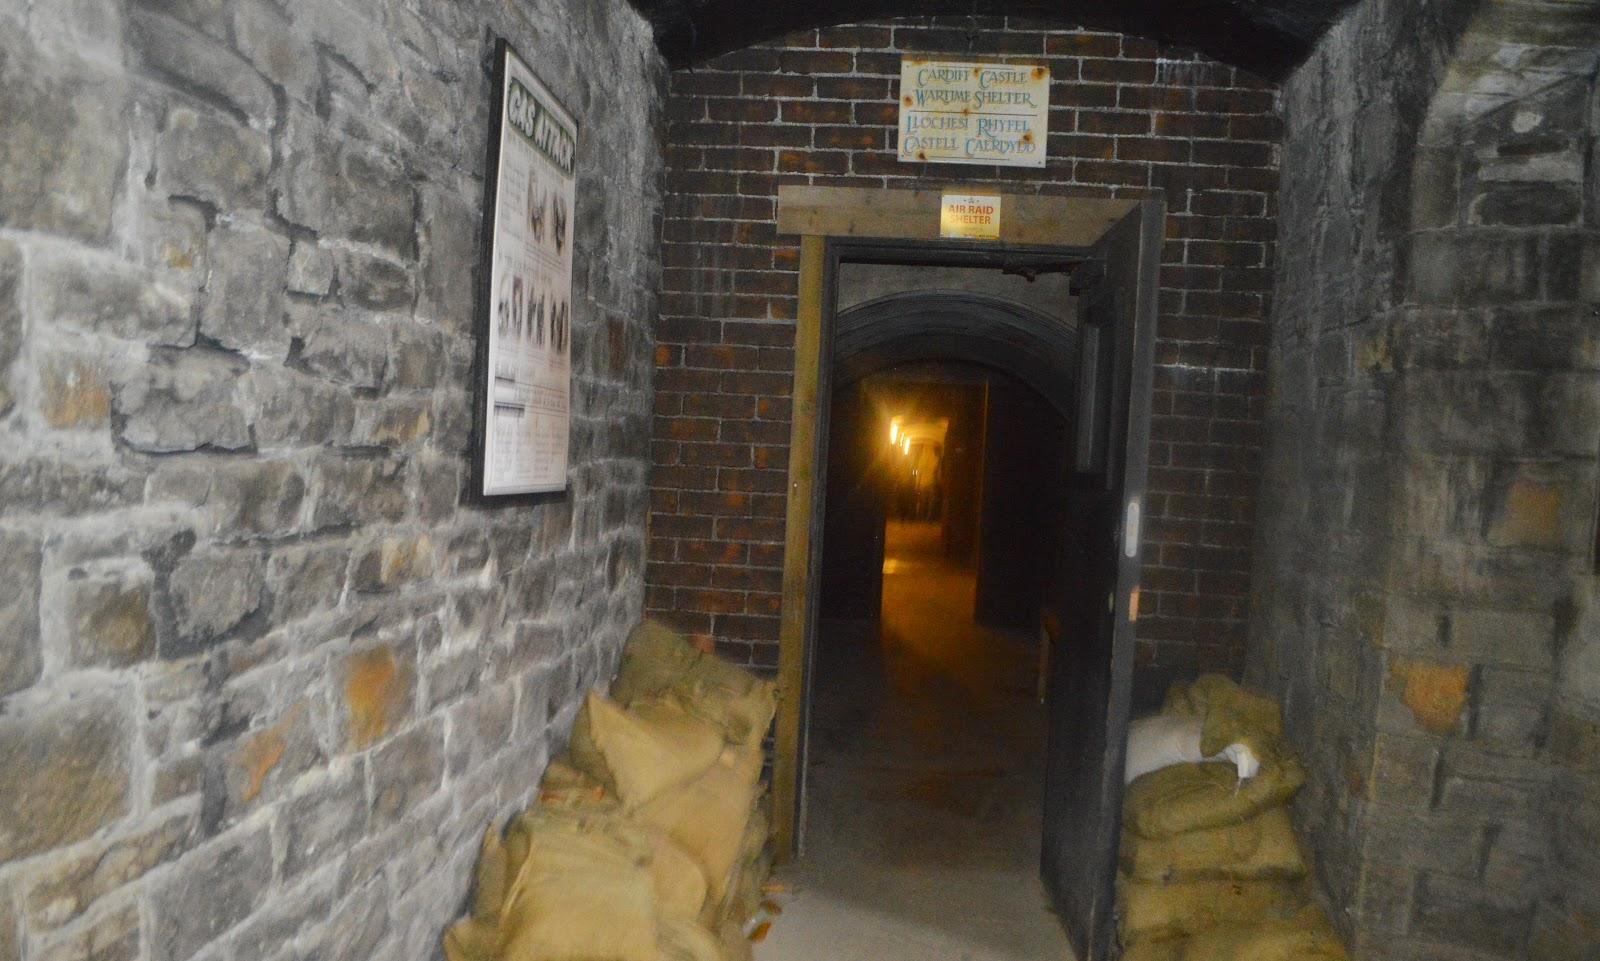 The War Shelter Tunnels Cardiff Castle Wales World War 2